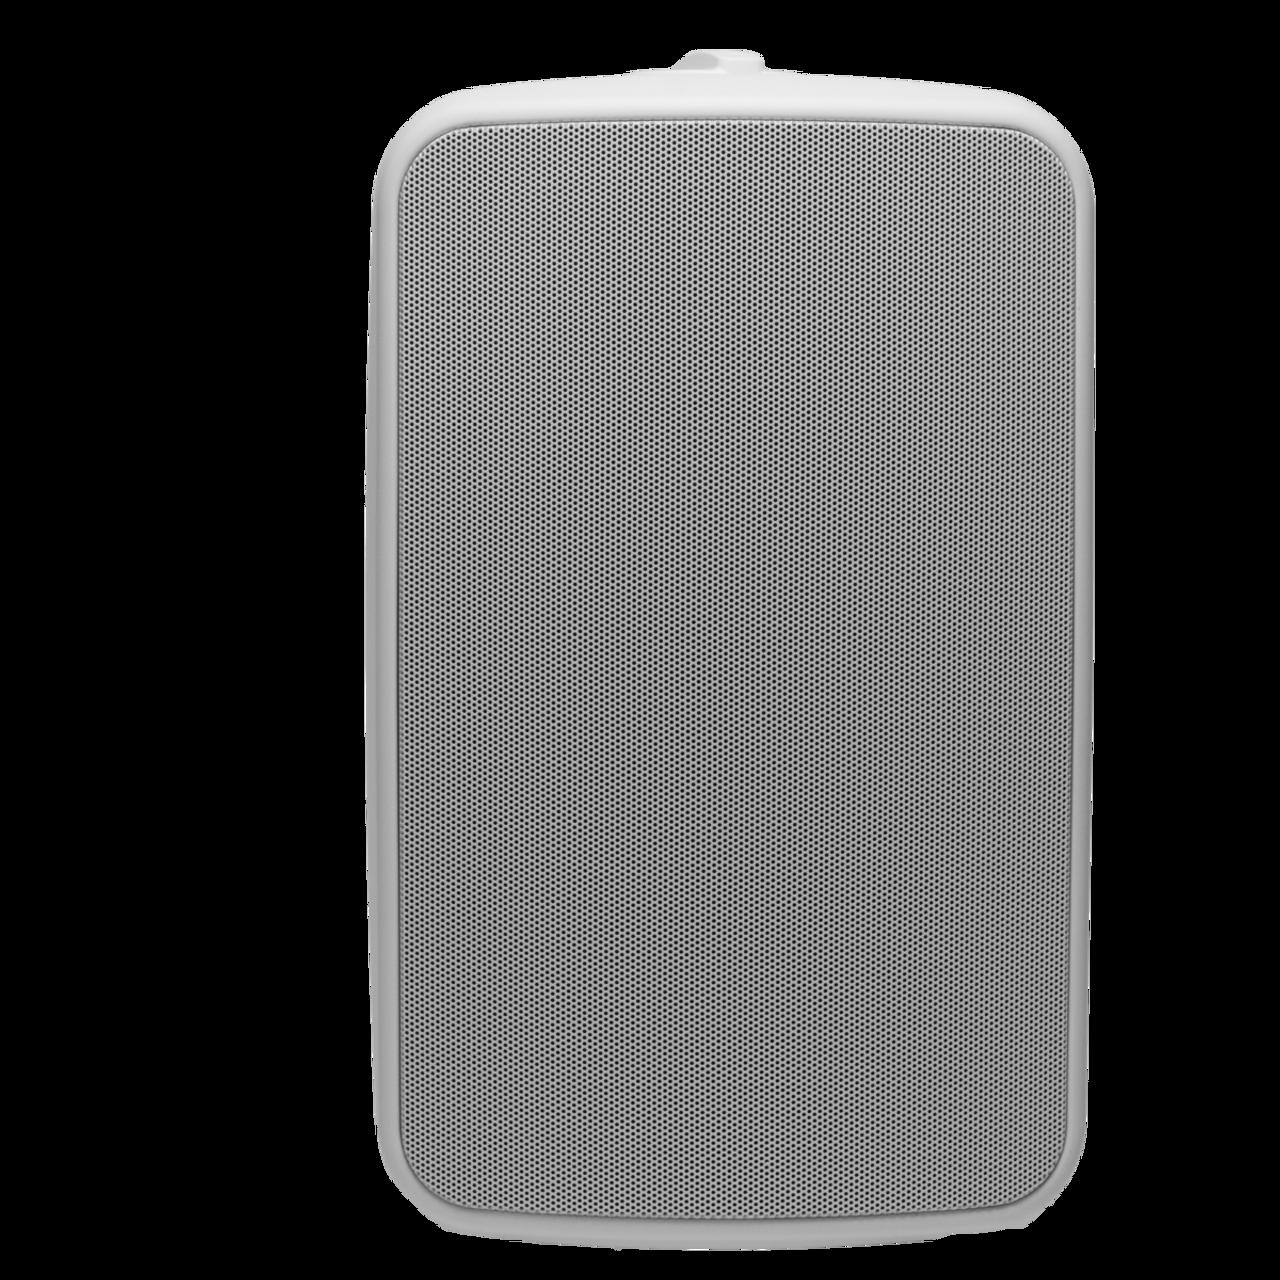 "TruAudio OP-5.2 5.25"" Injected Poly Weather Proof Outdoor Speaker With Bracket (Each)"